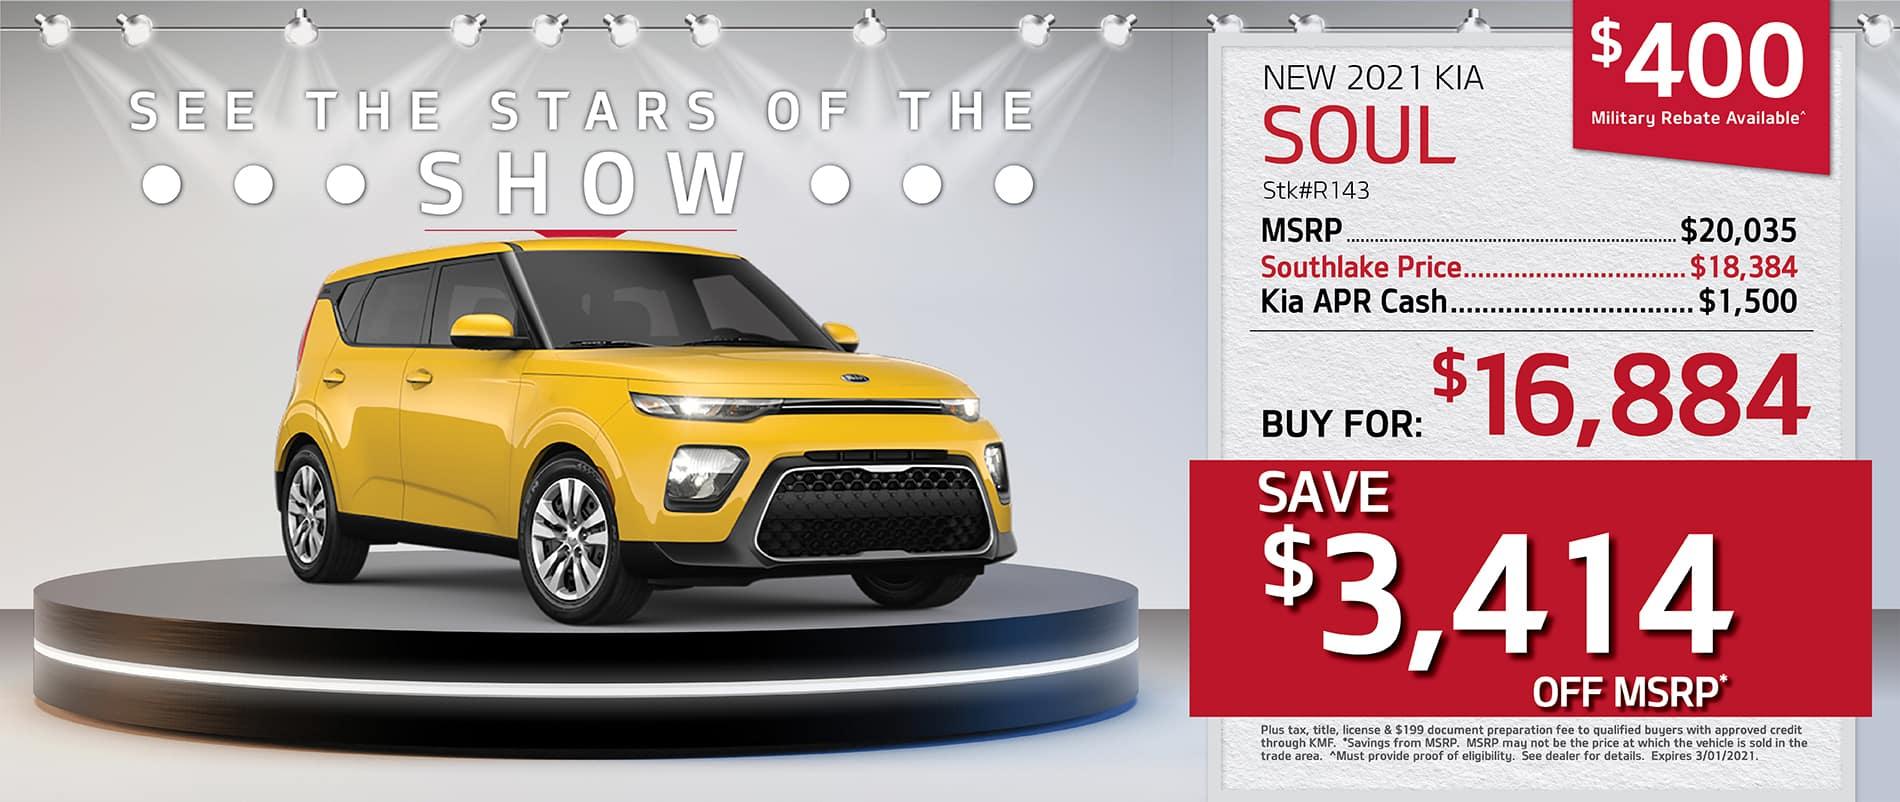 2021 Kia Soul Finance Offer | Merrillville, Indiana